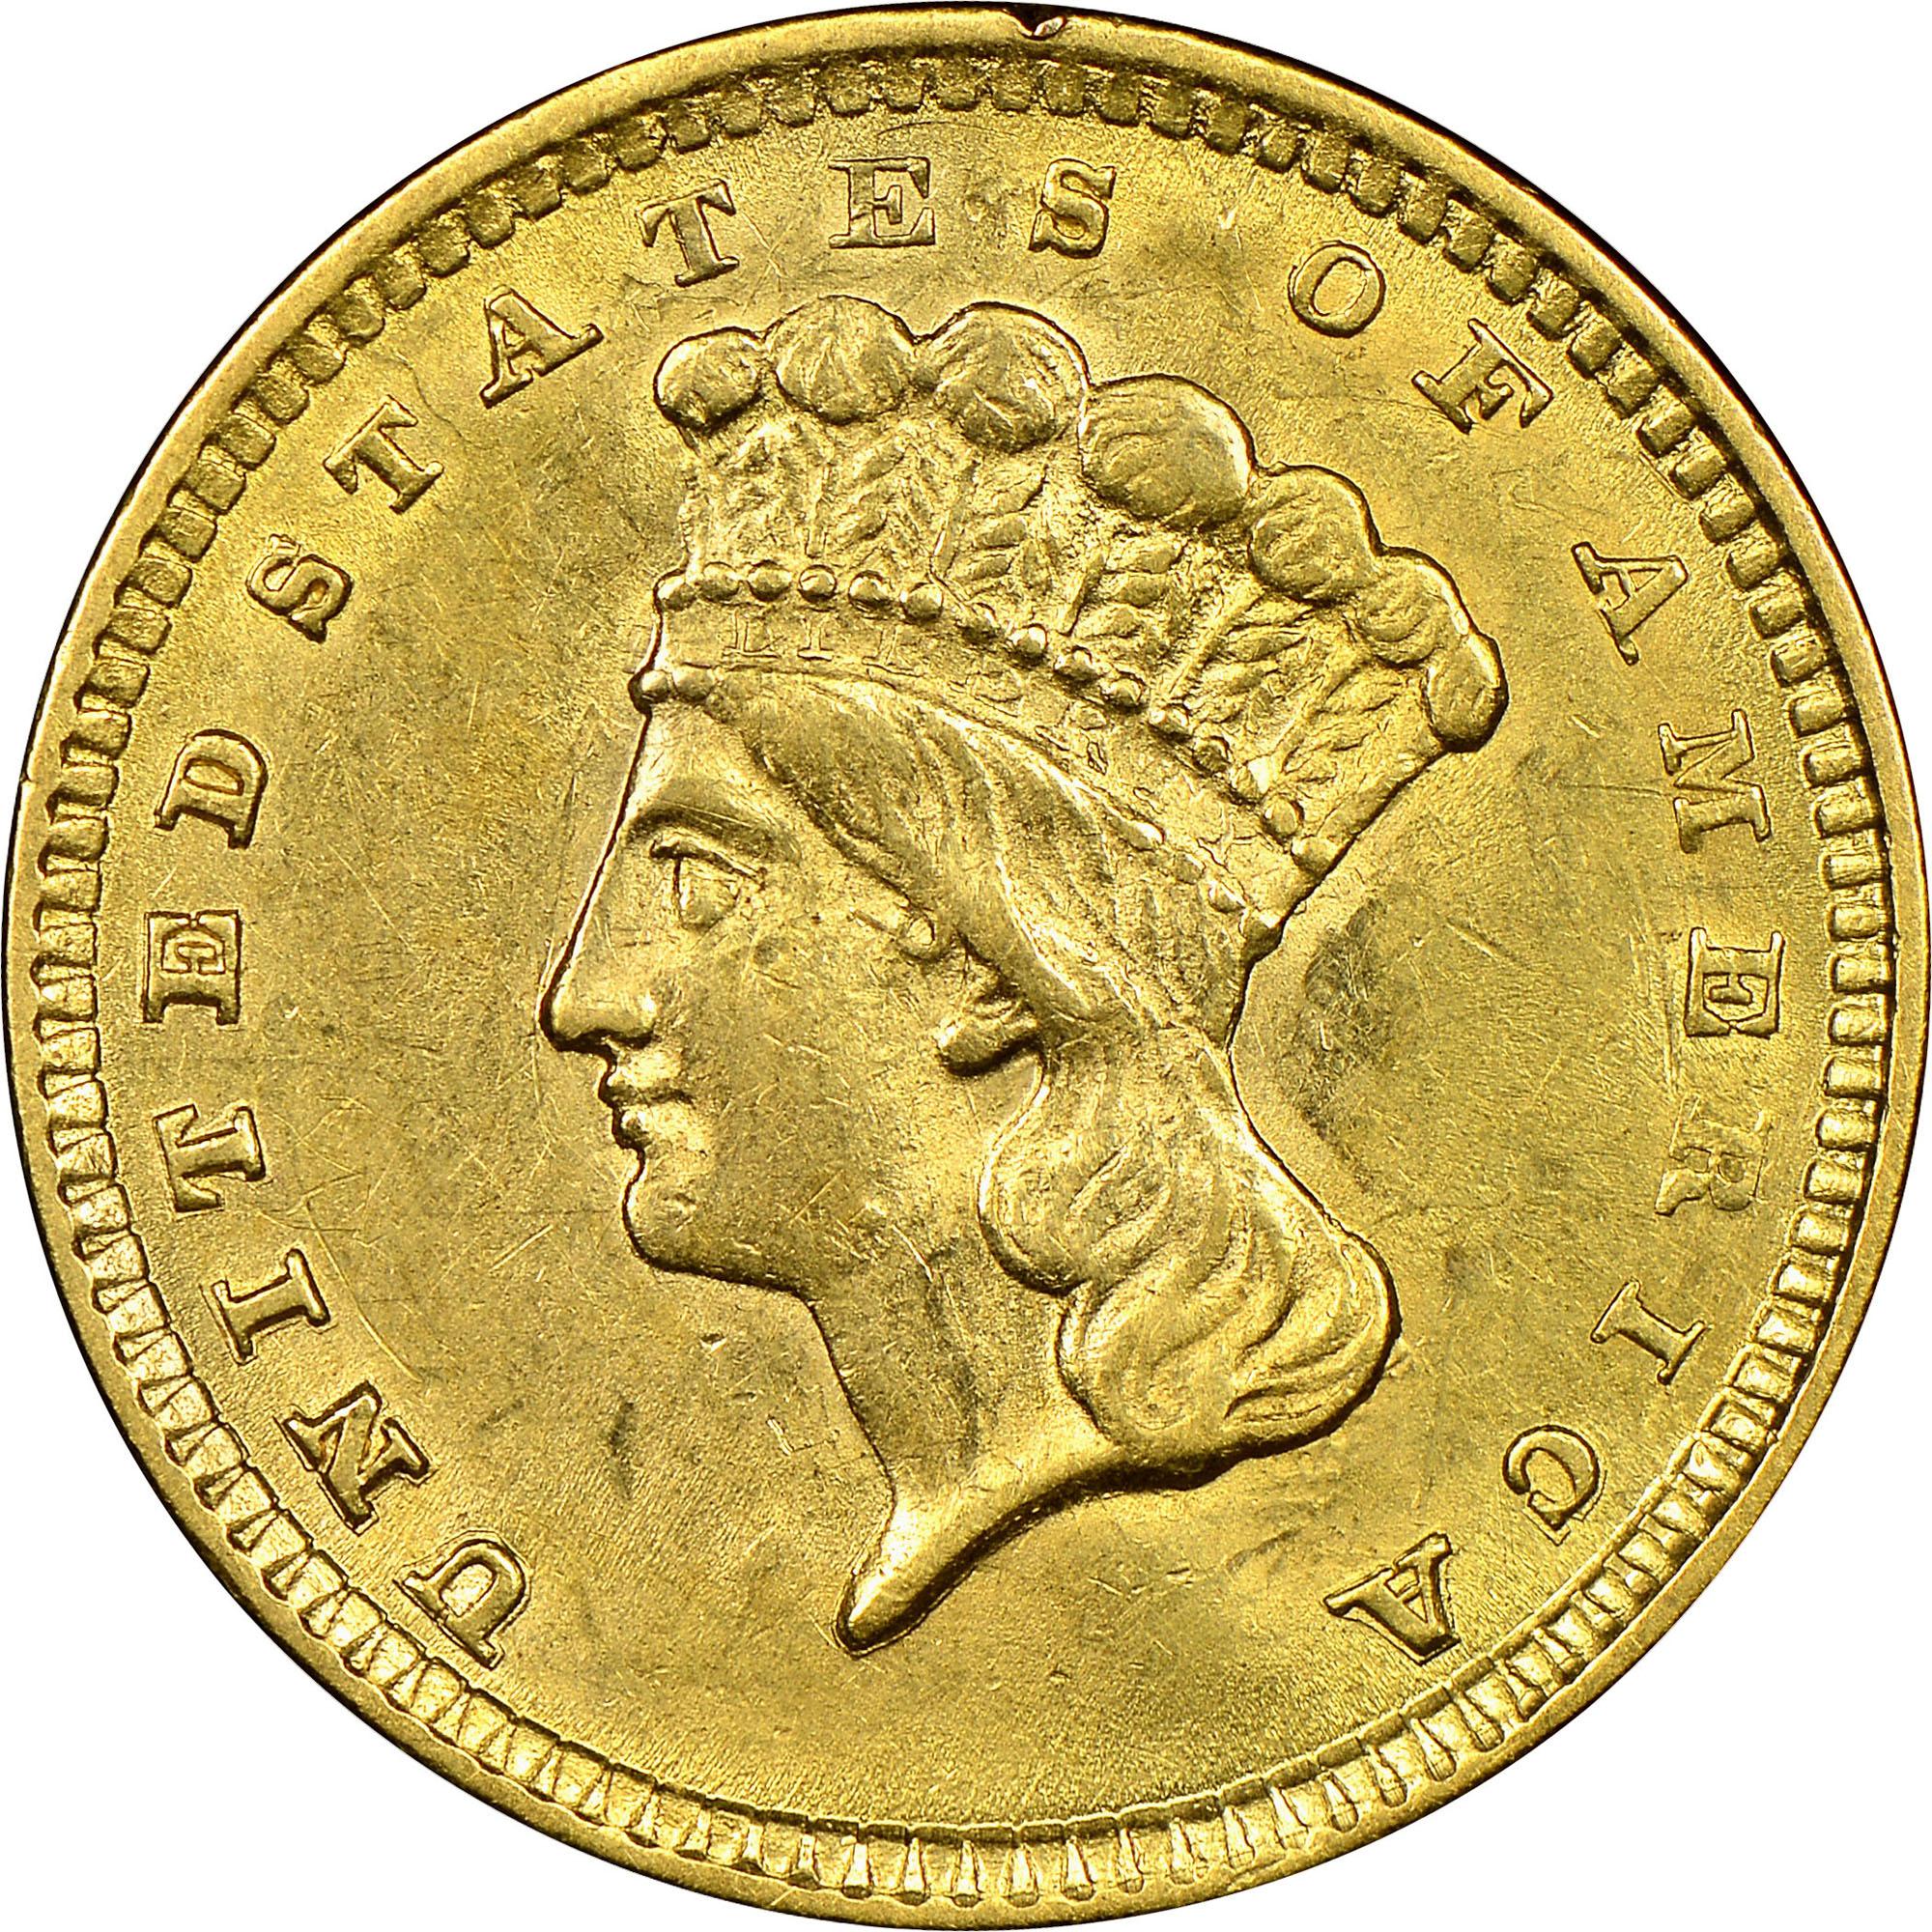 1857 G 1 MS Gold Dollars NGC